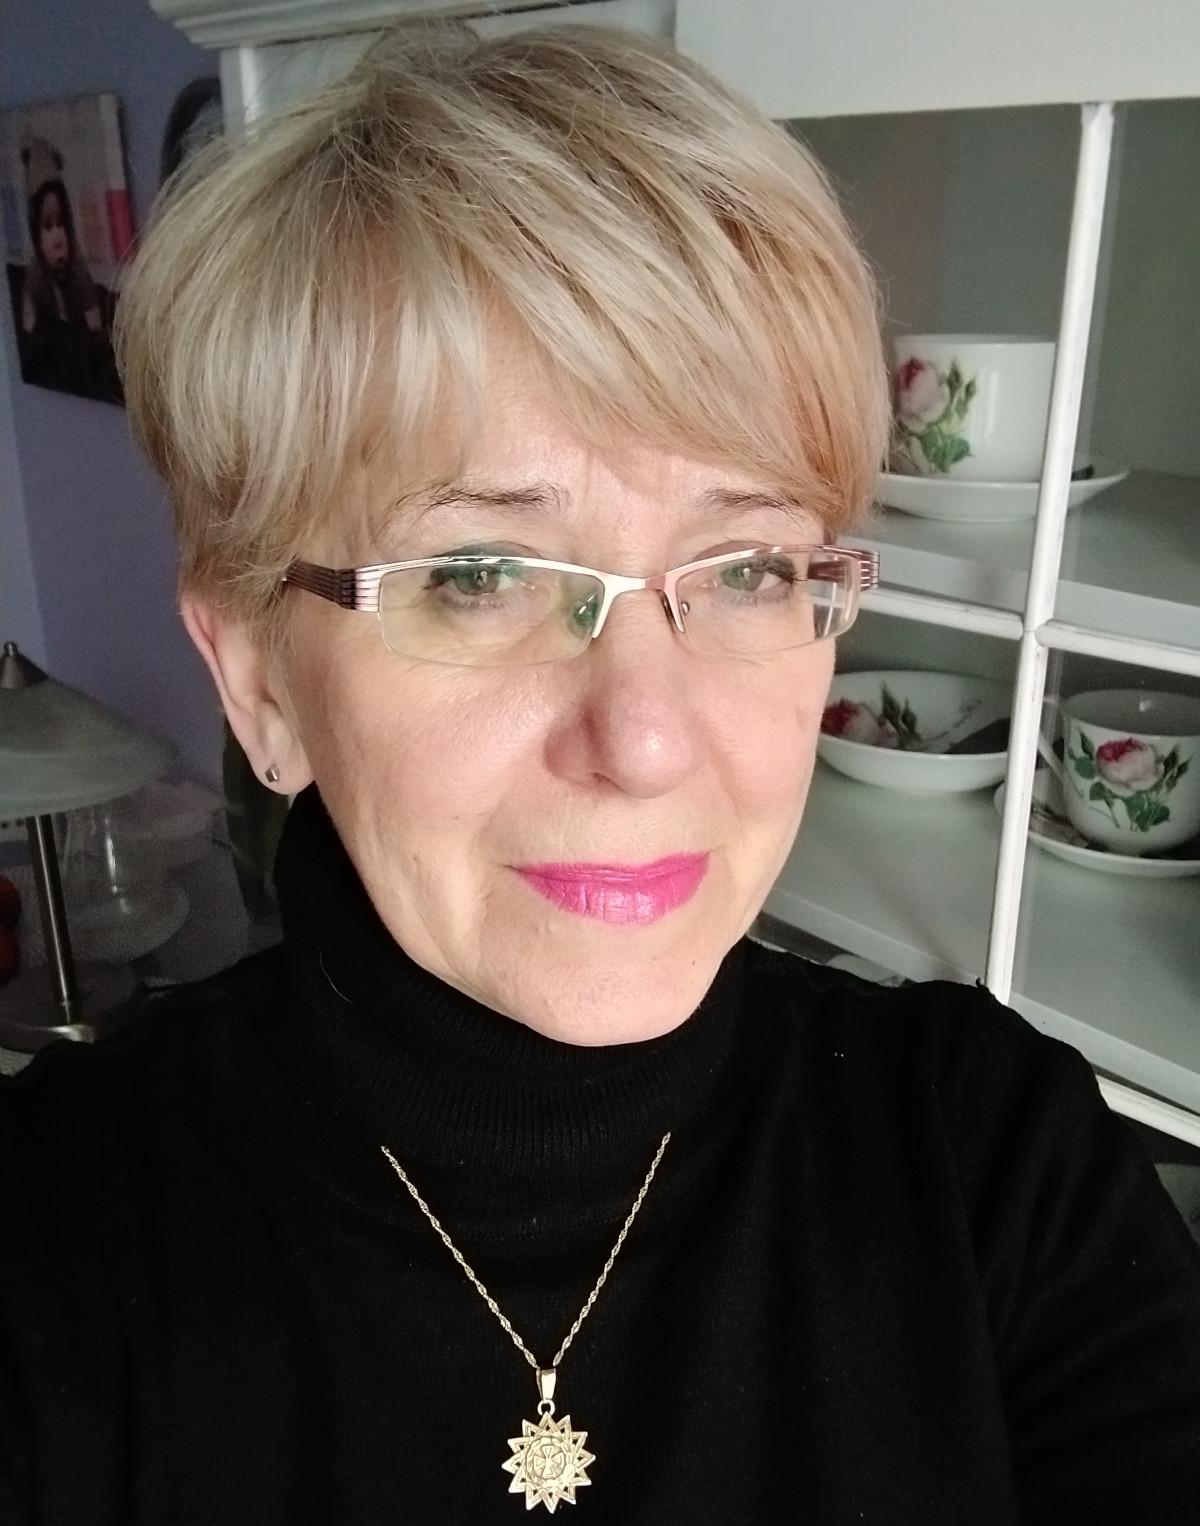 Jolanta Zbiegieni-Kubacka